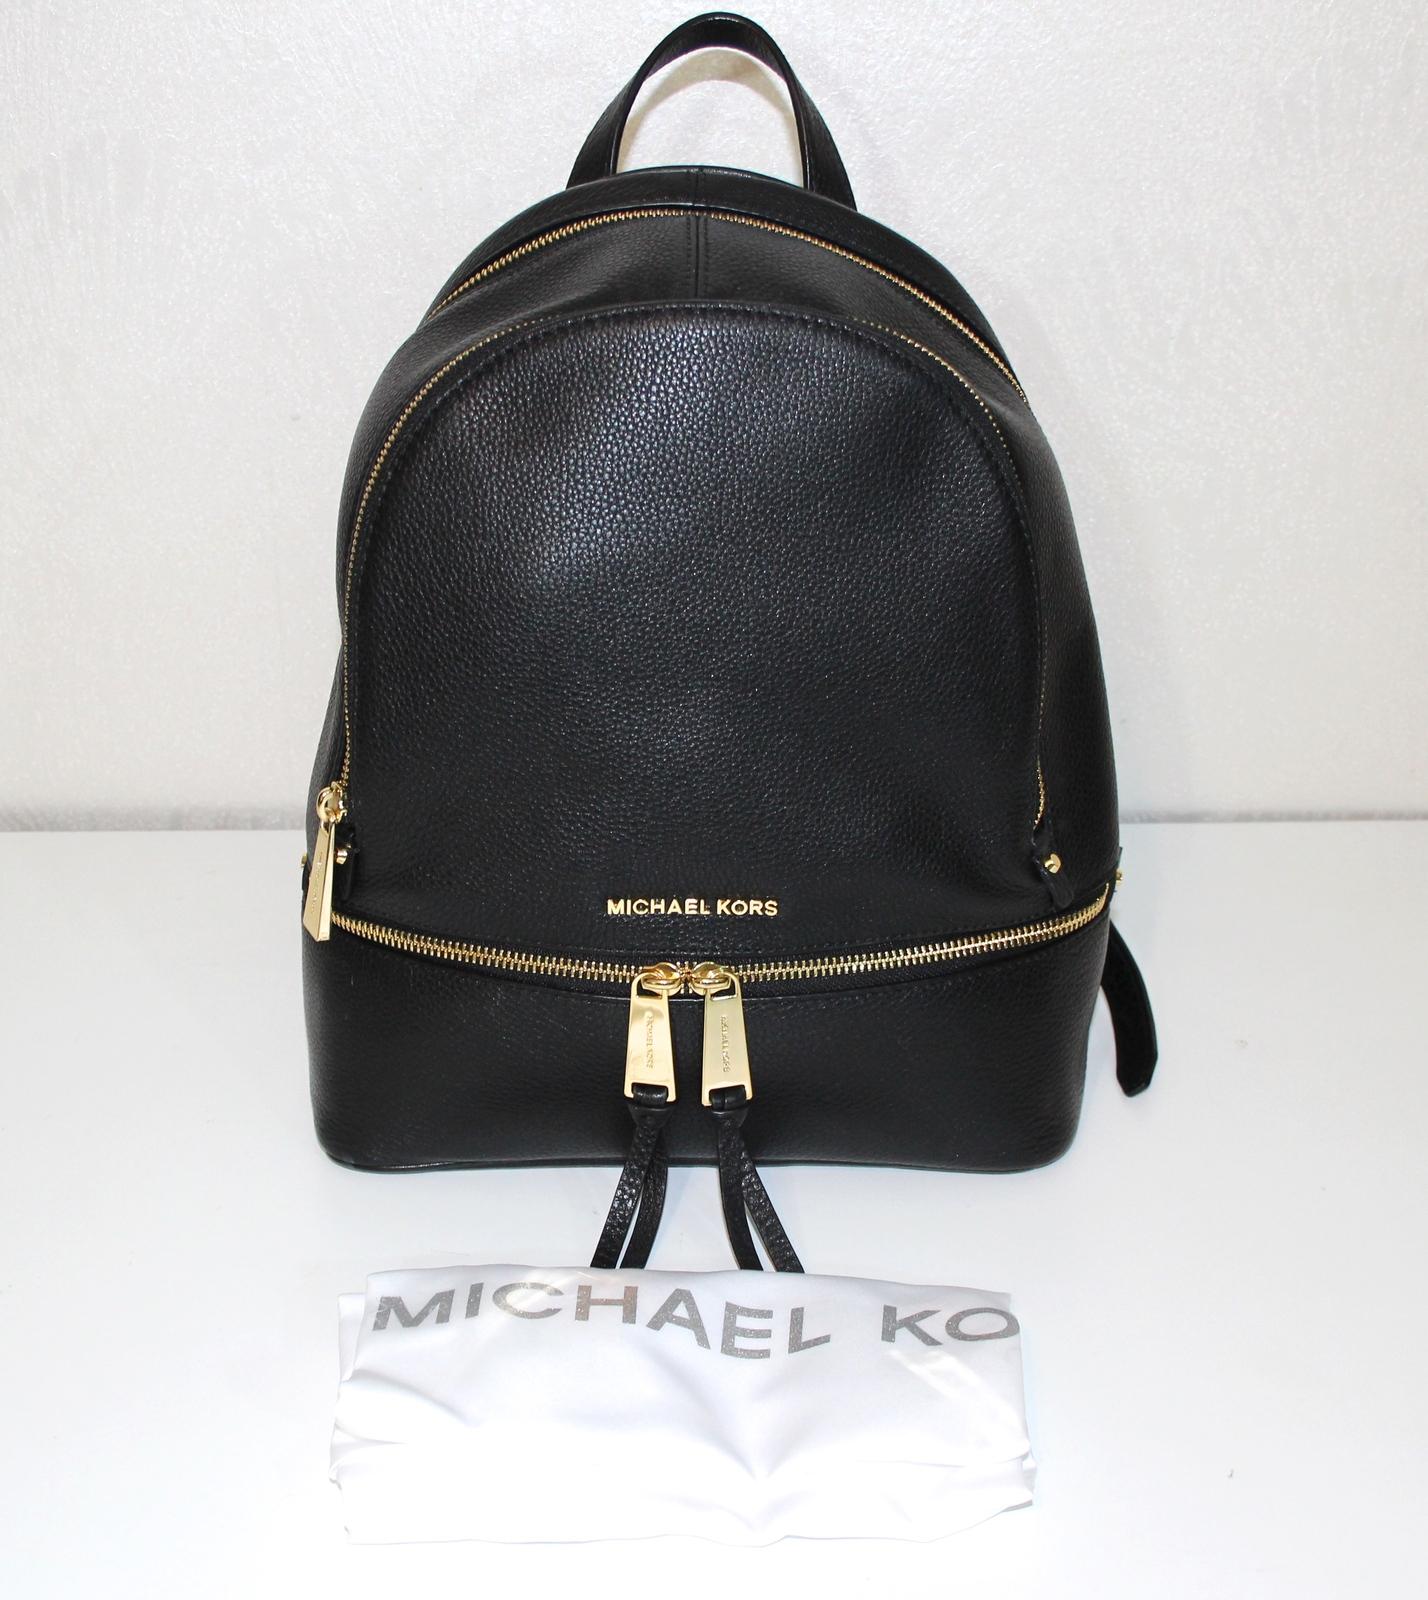 32db9507ce4e Michael Kors Rhea Backpack Medium Black and 50 similar items. Img 1400